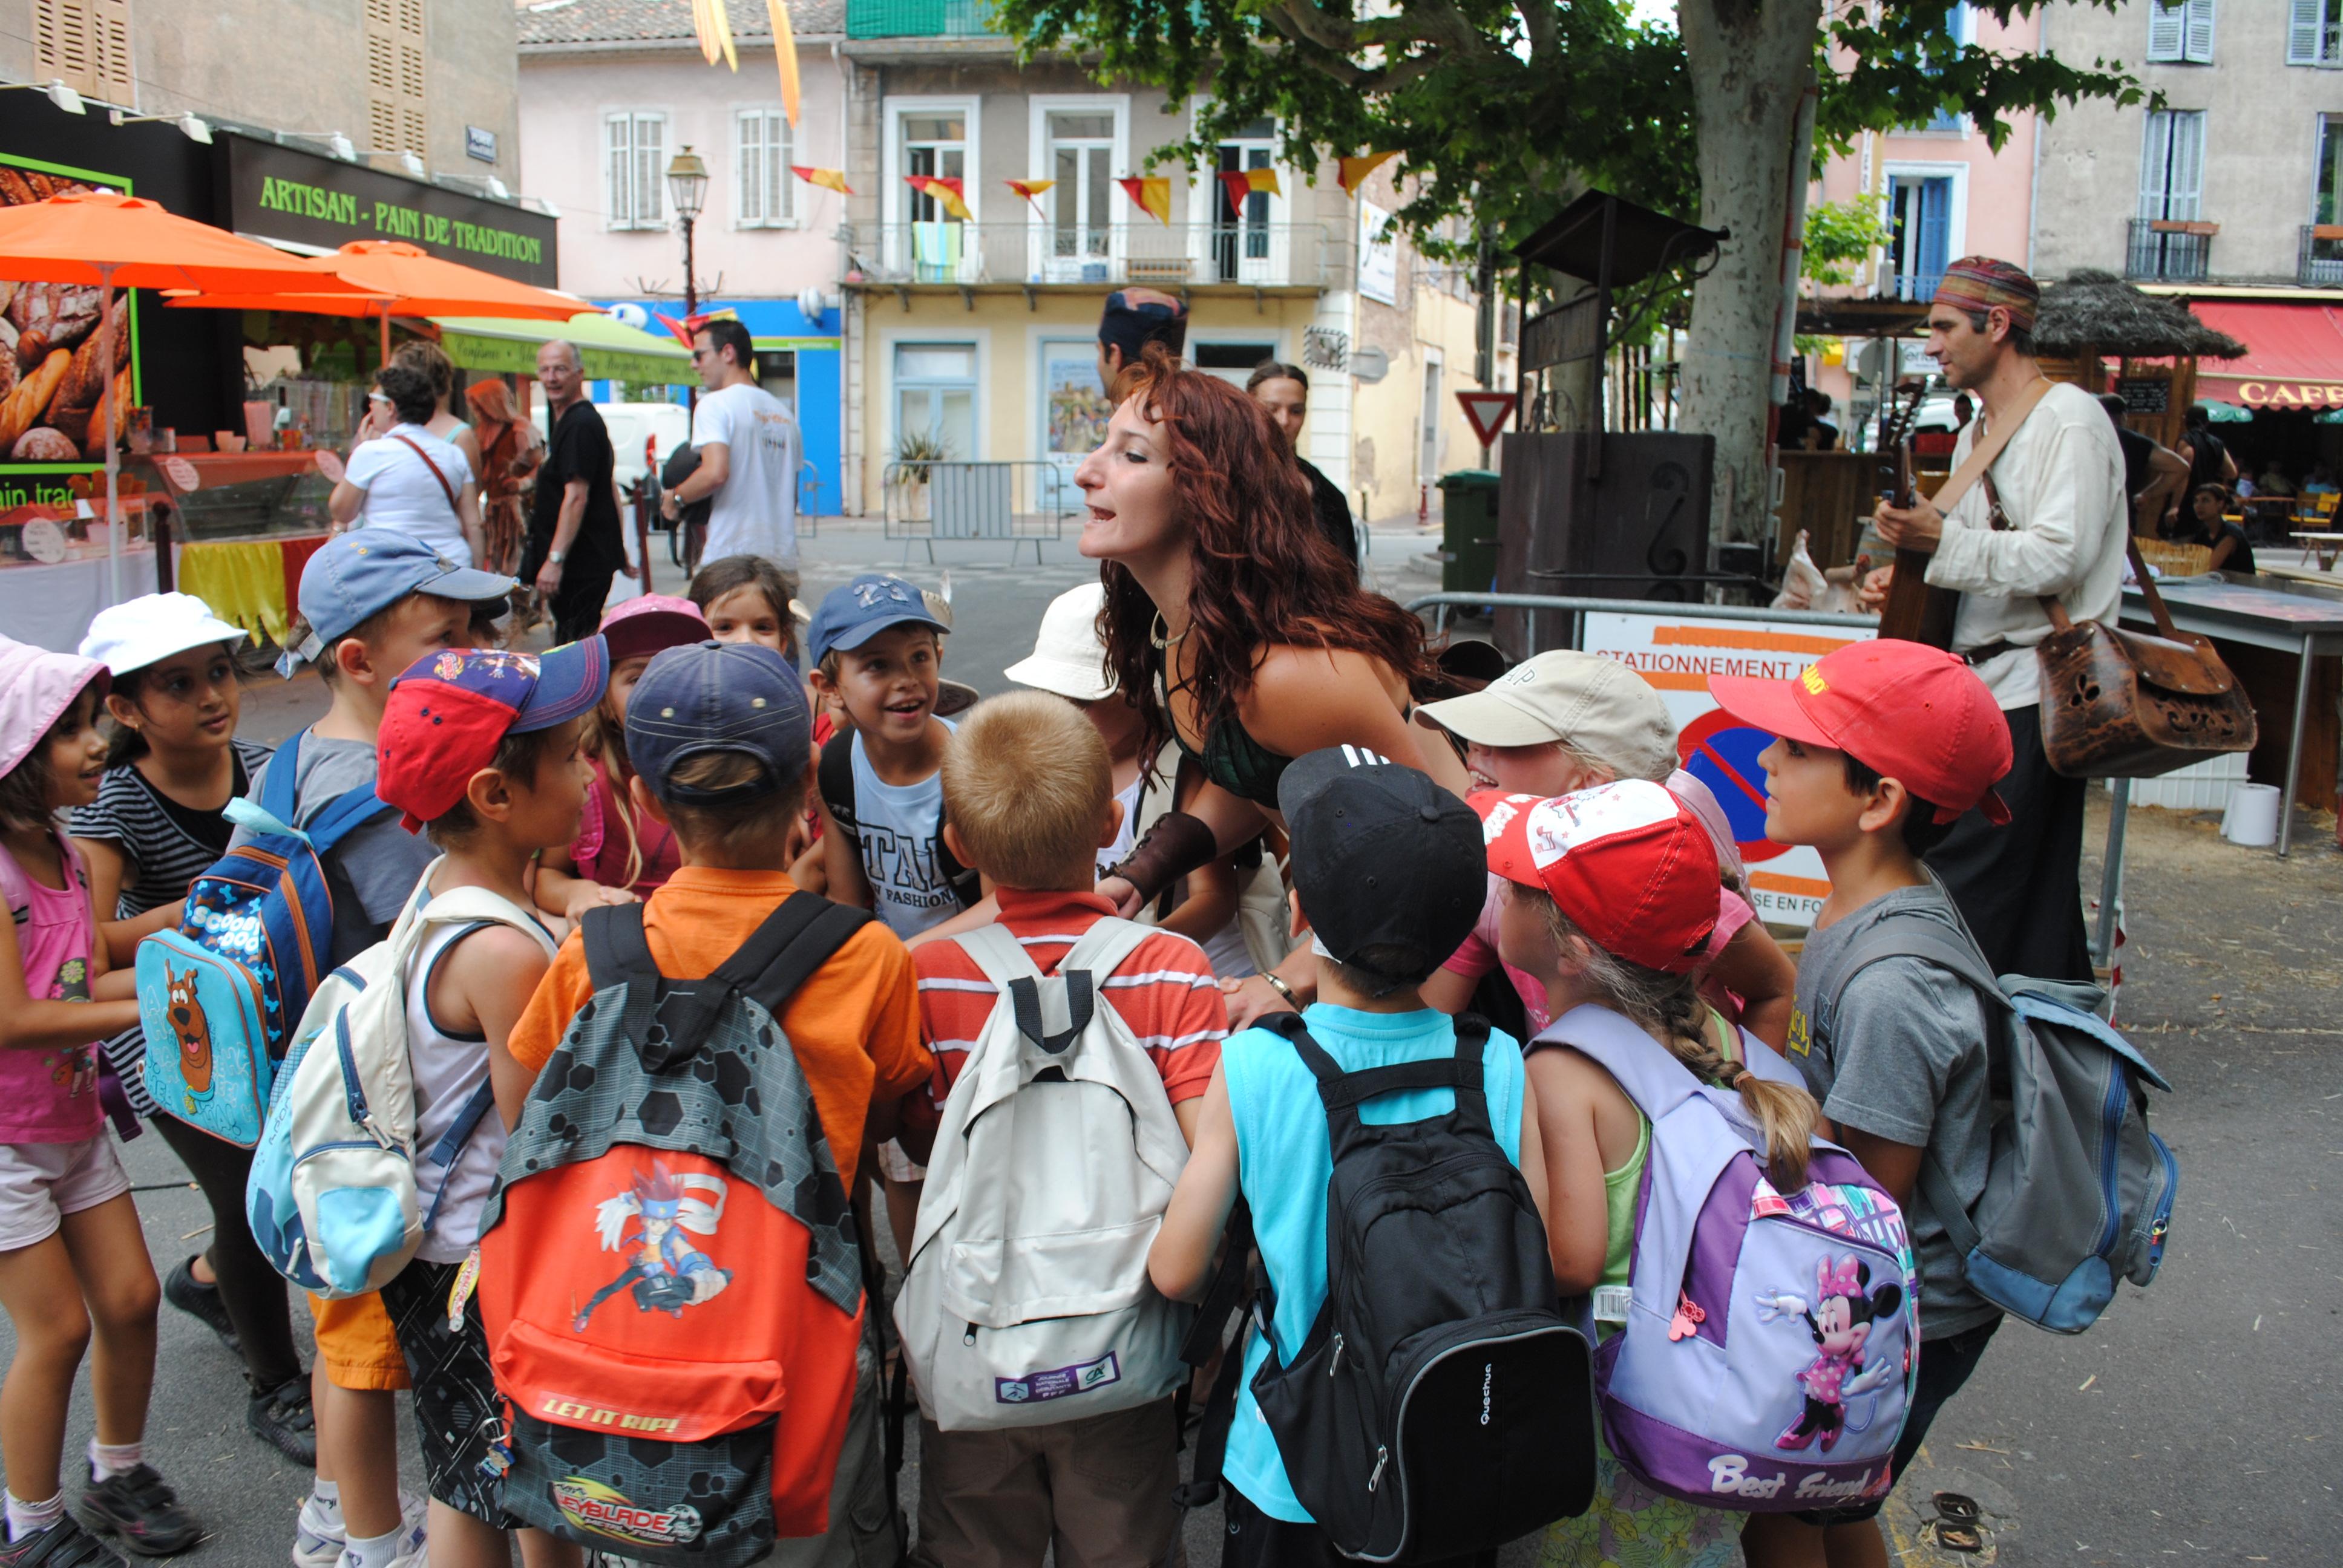 Djinjols danse avec les enfants